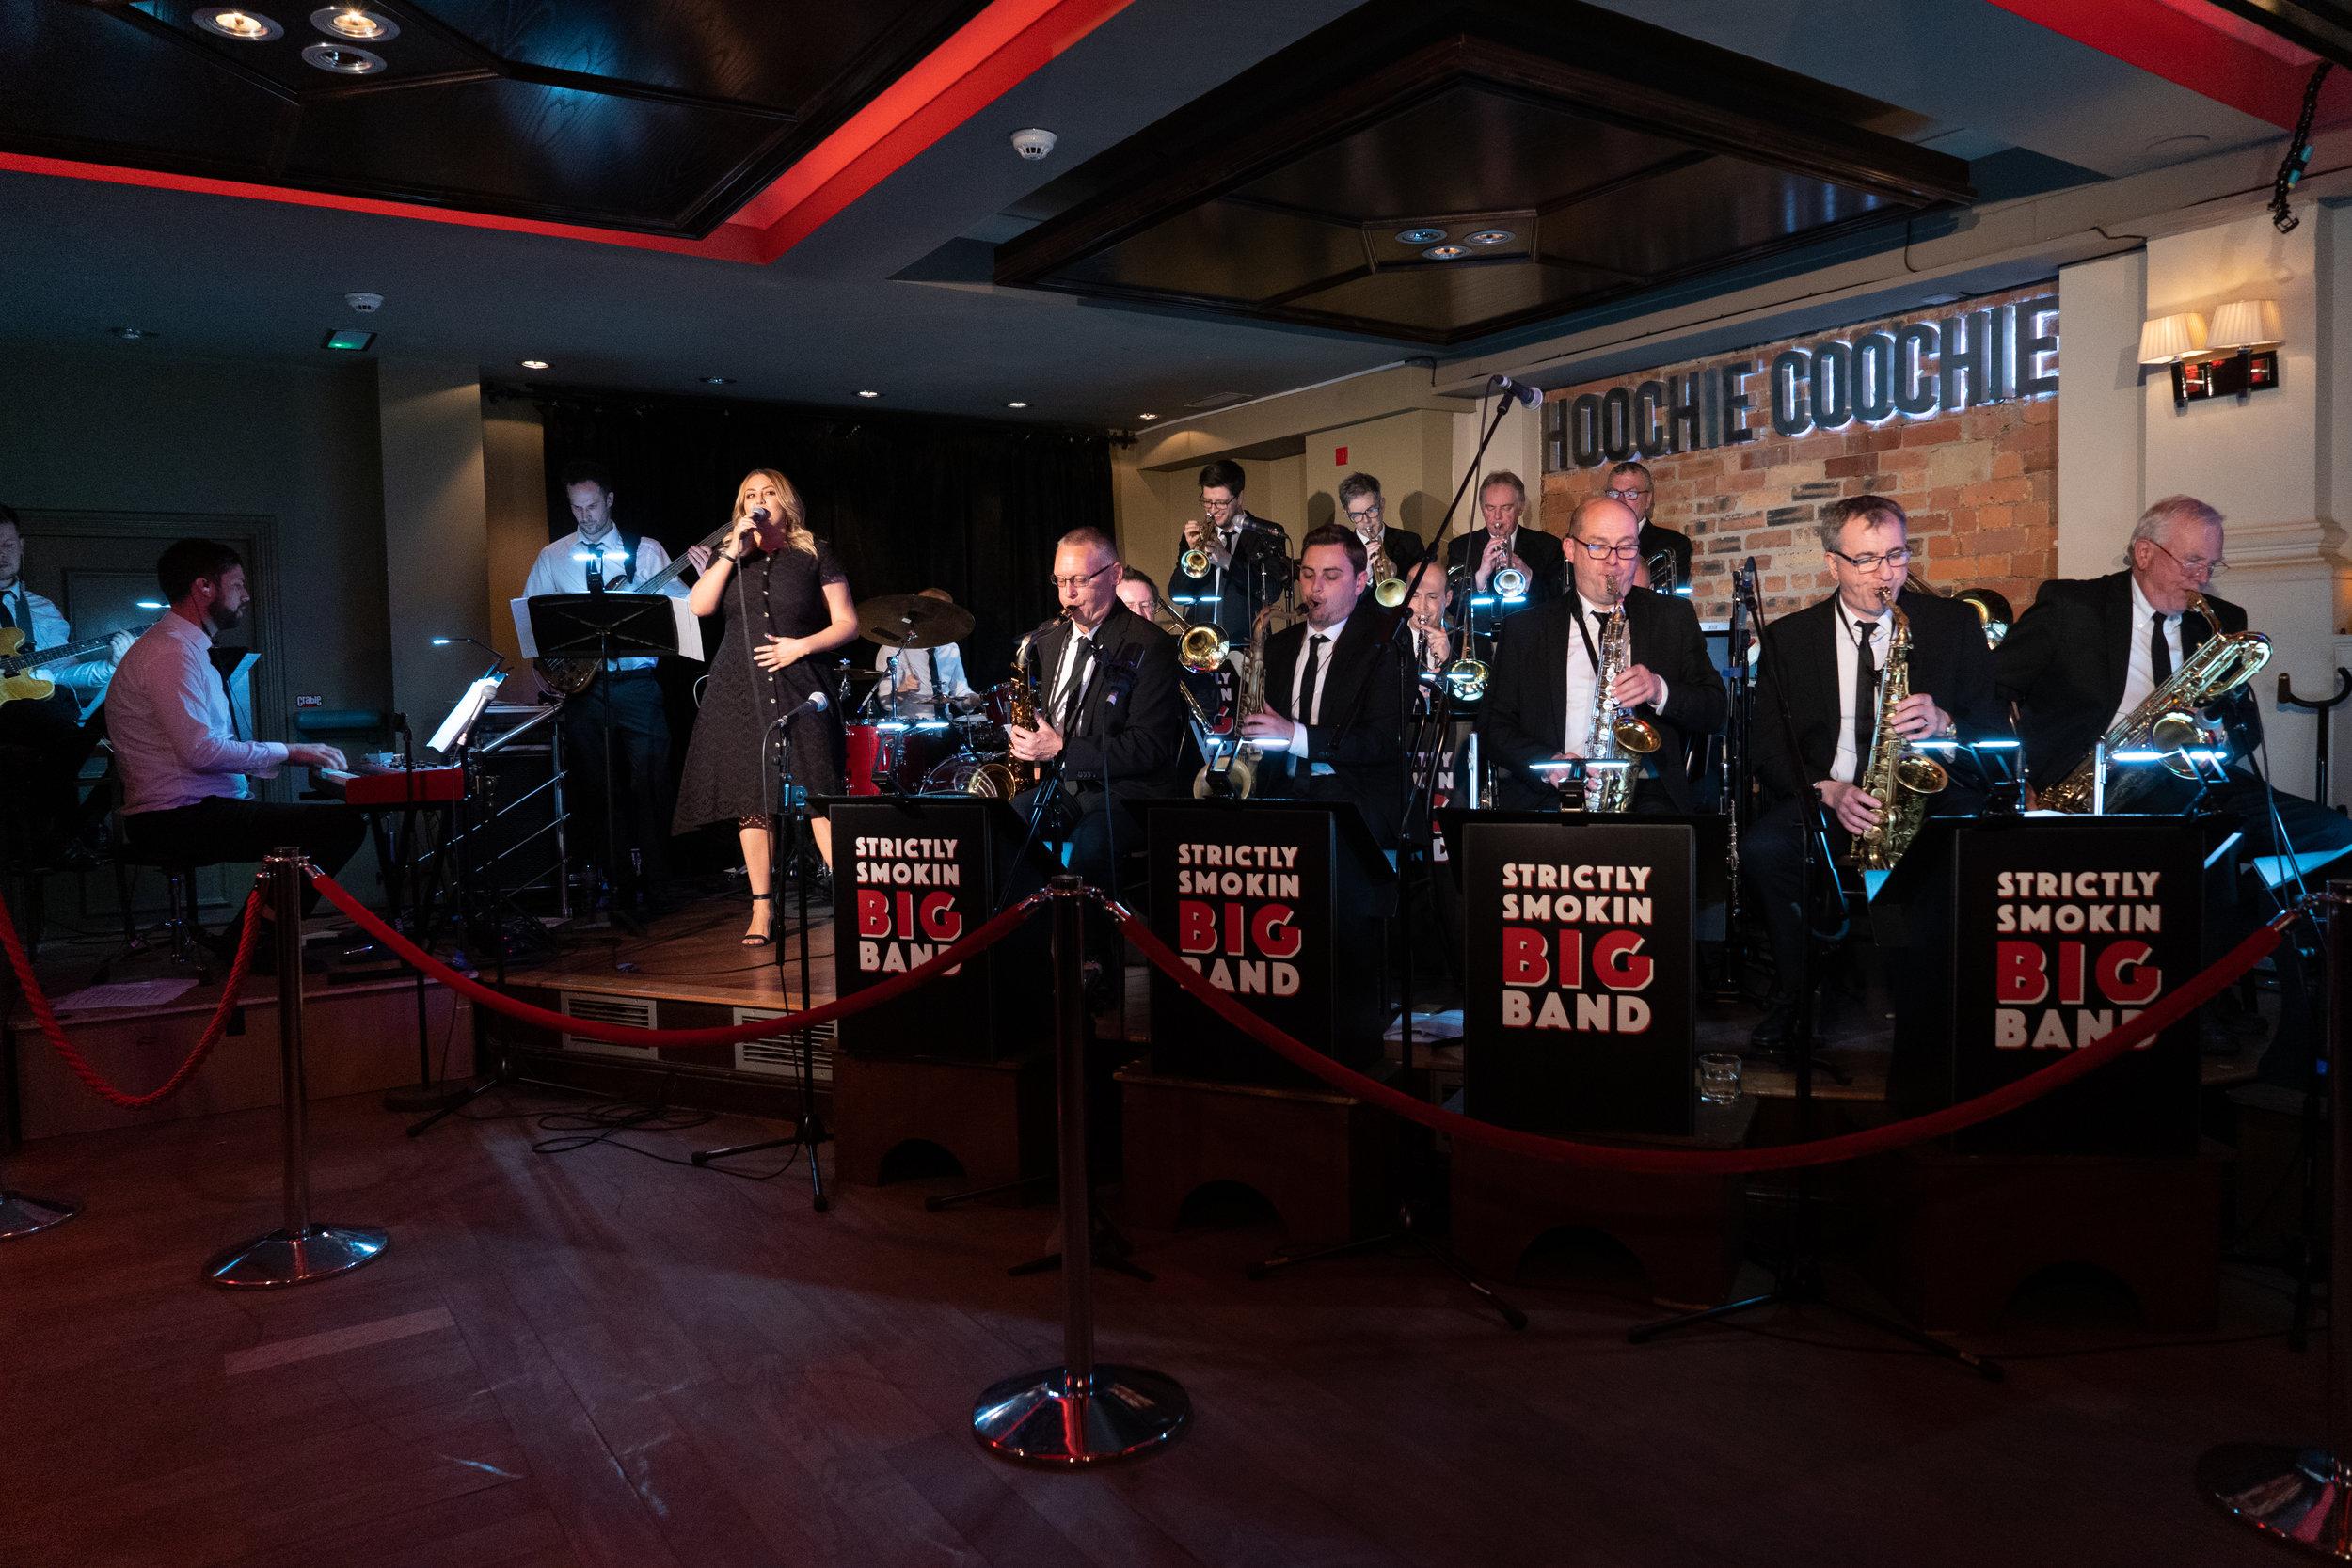 Strictly-Smokin Big Band